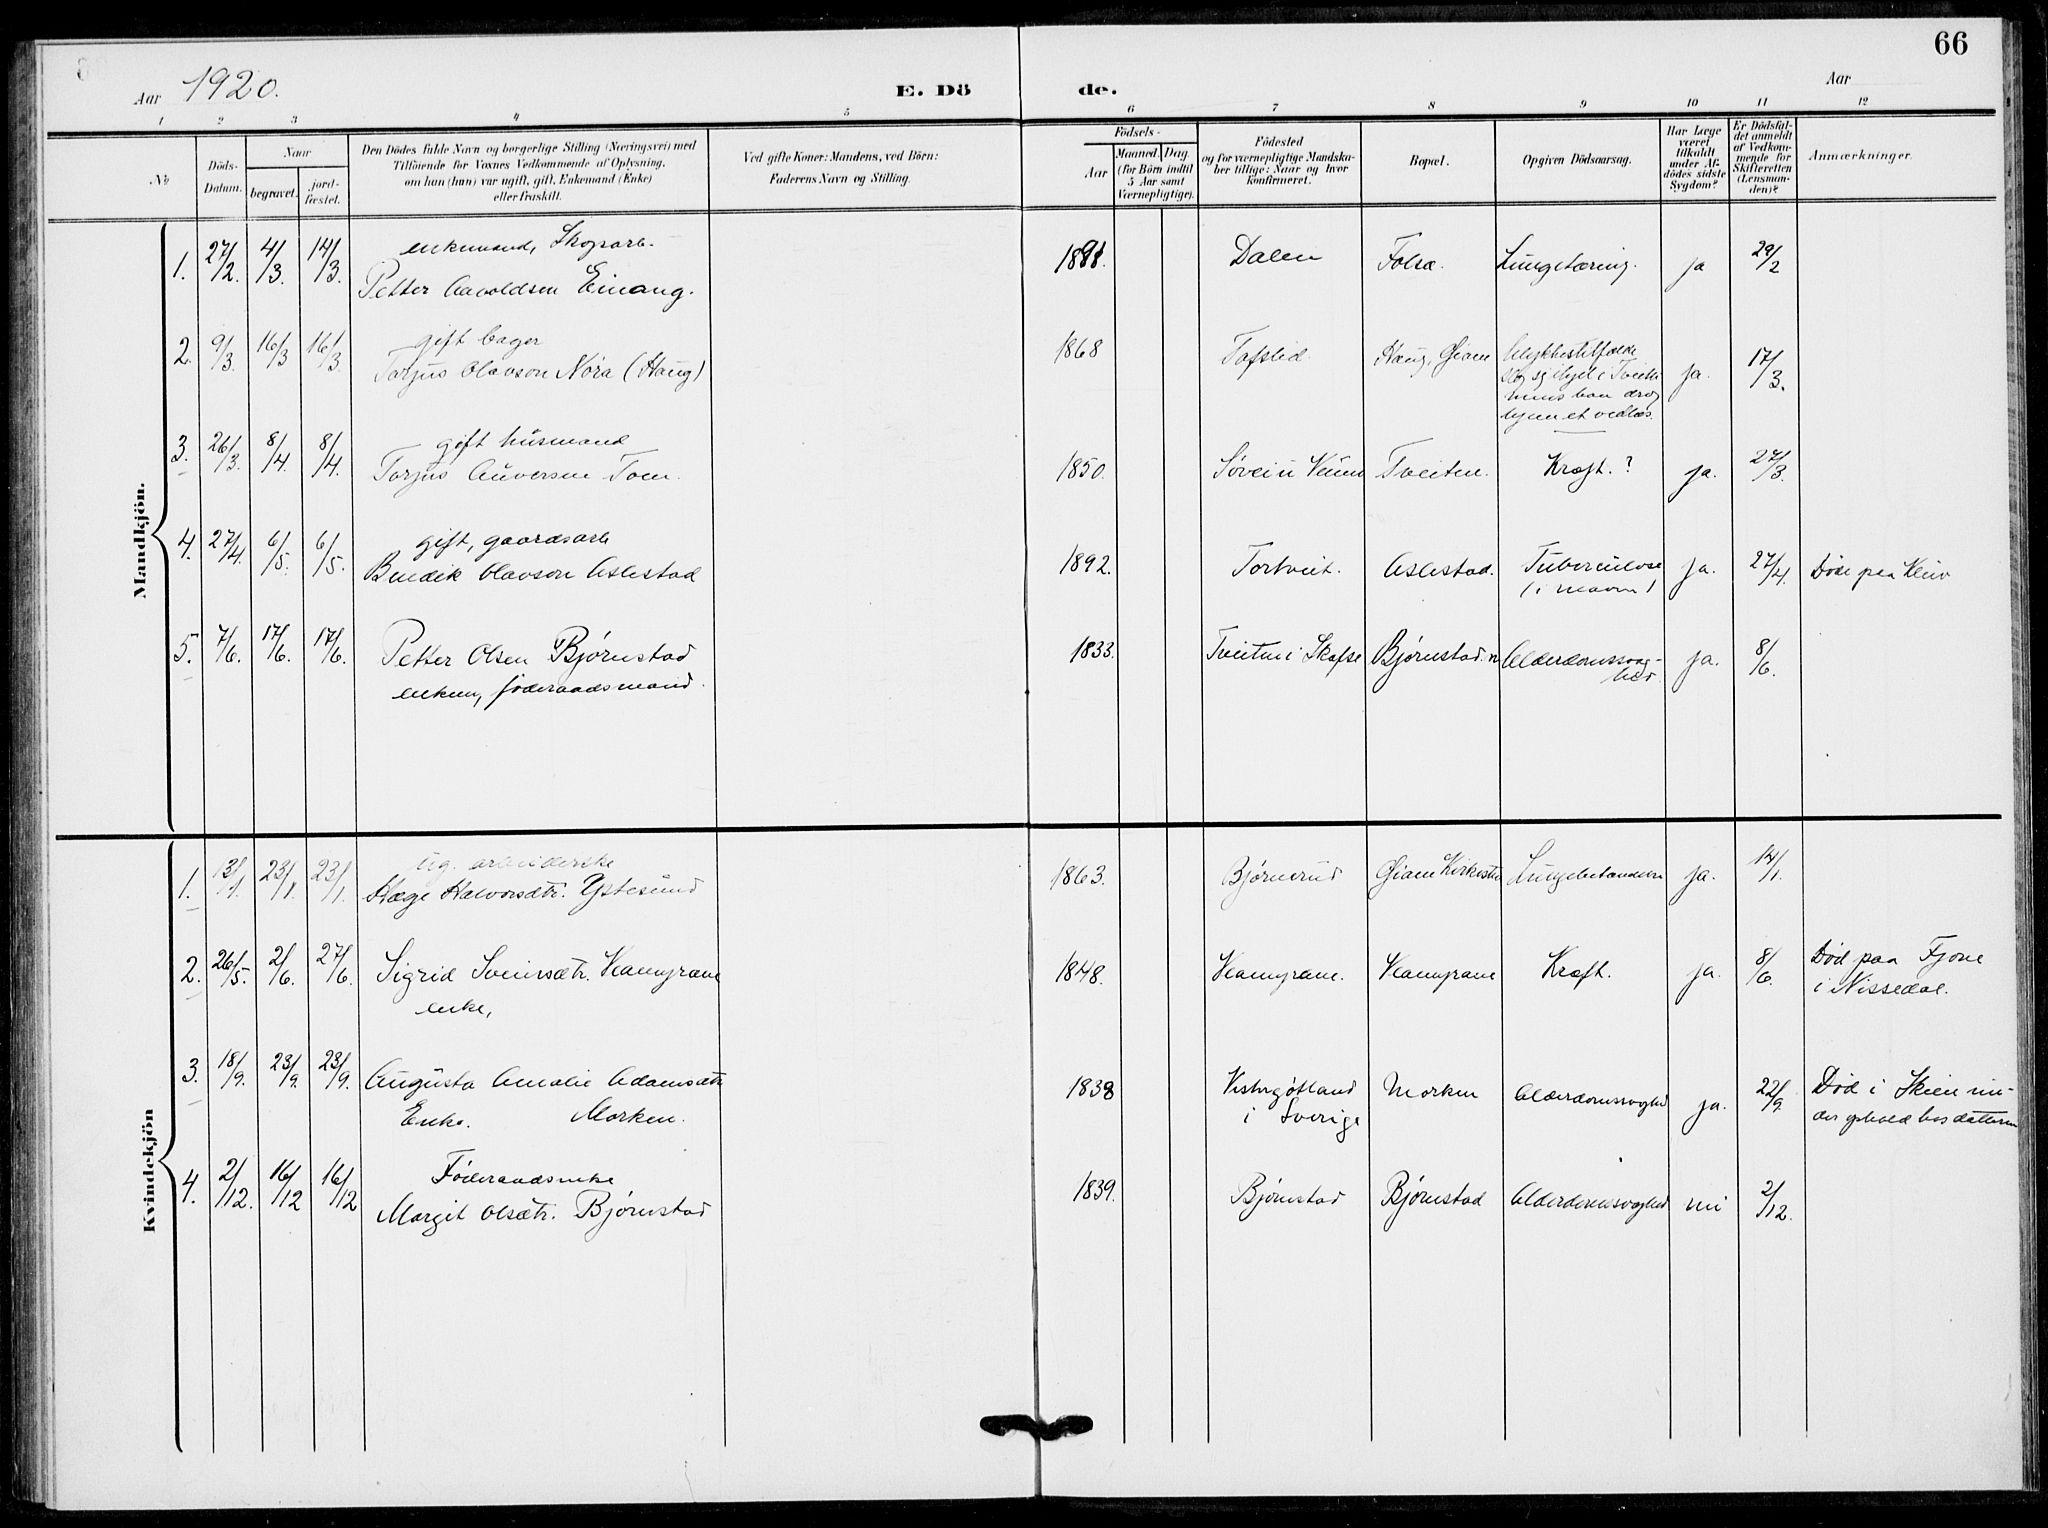 SAKO, Fyresdal kirkebøker, F/Fb/L0004: Ministerialbok nr. II 4, 1903-1920, s. 66